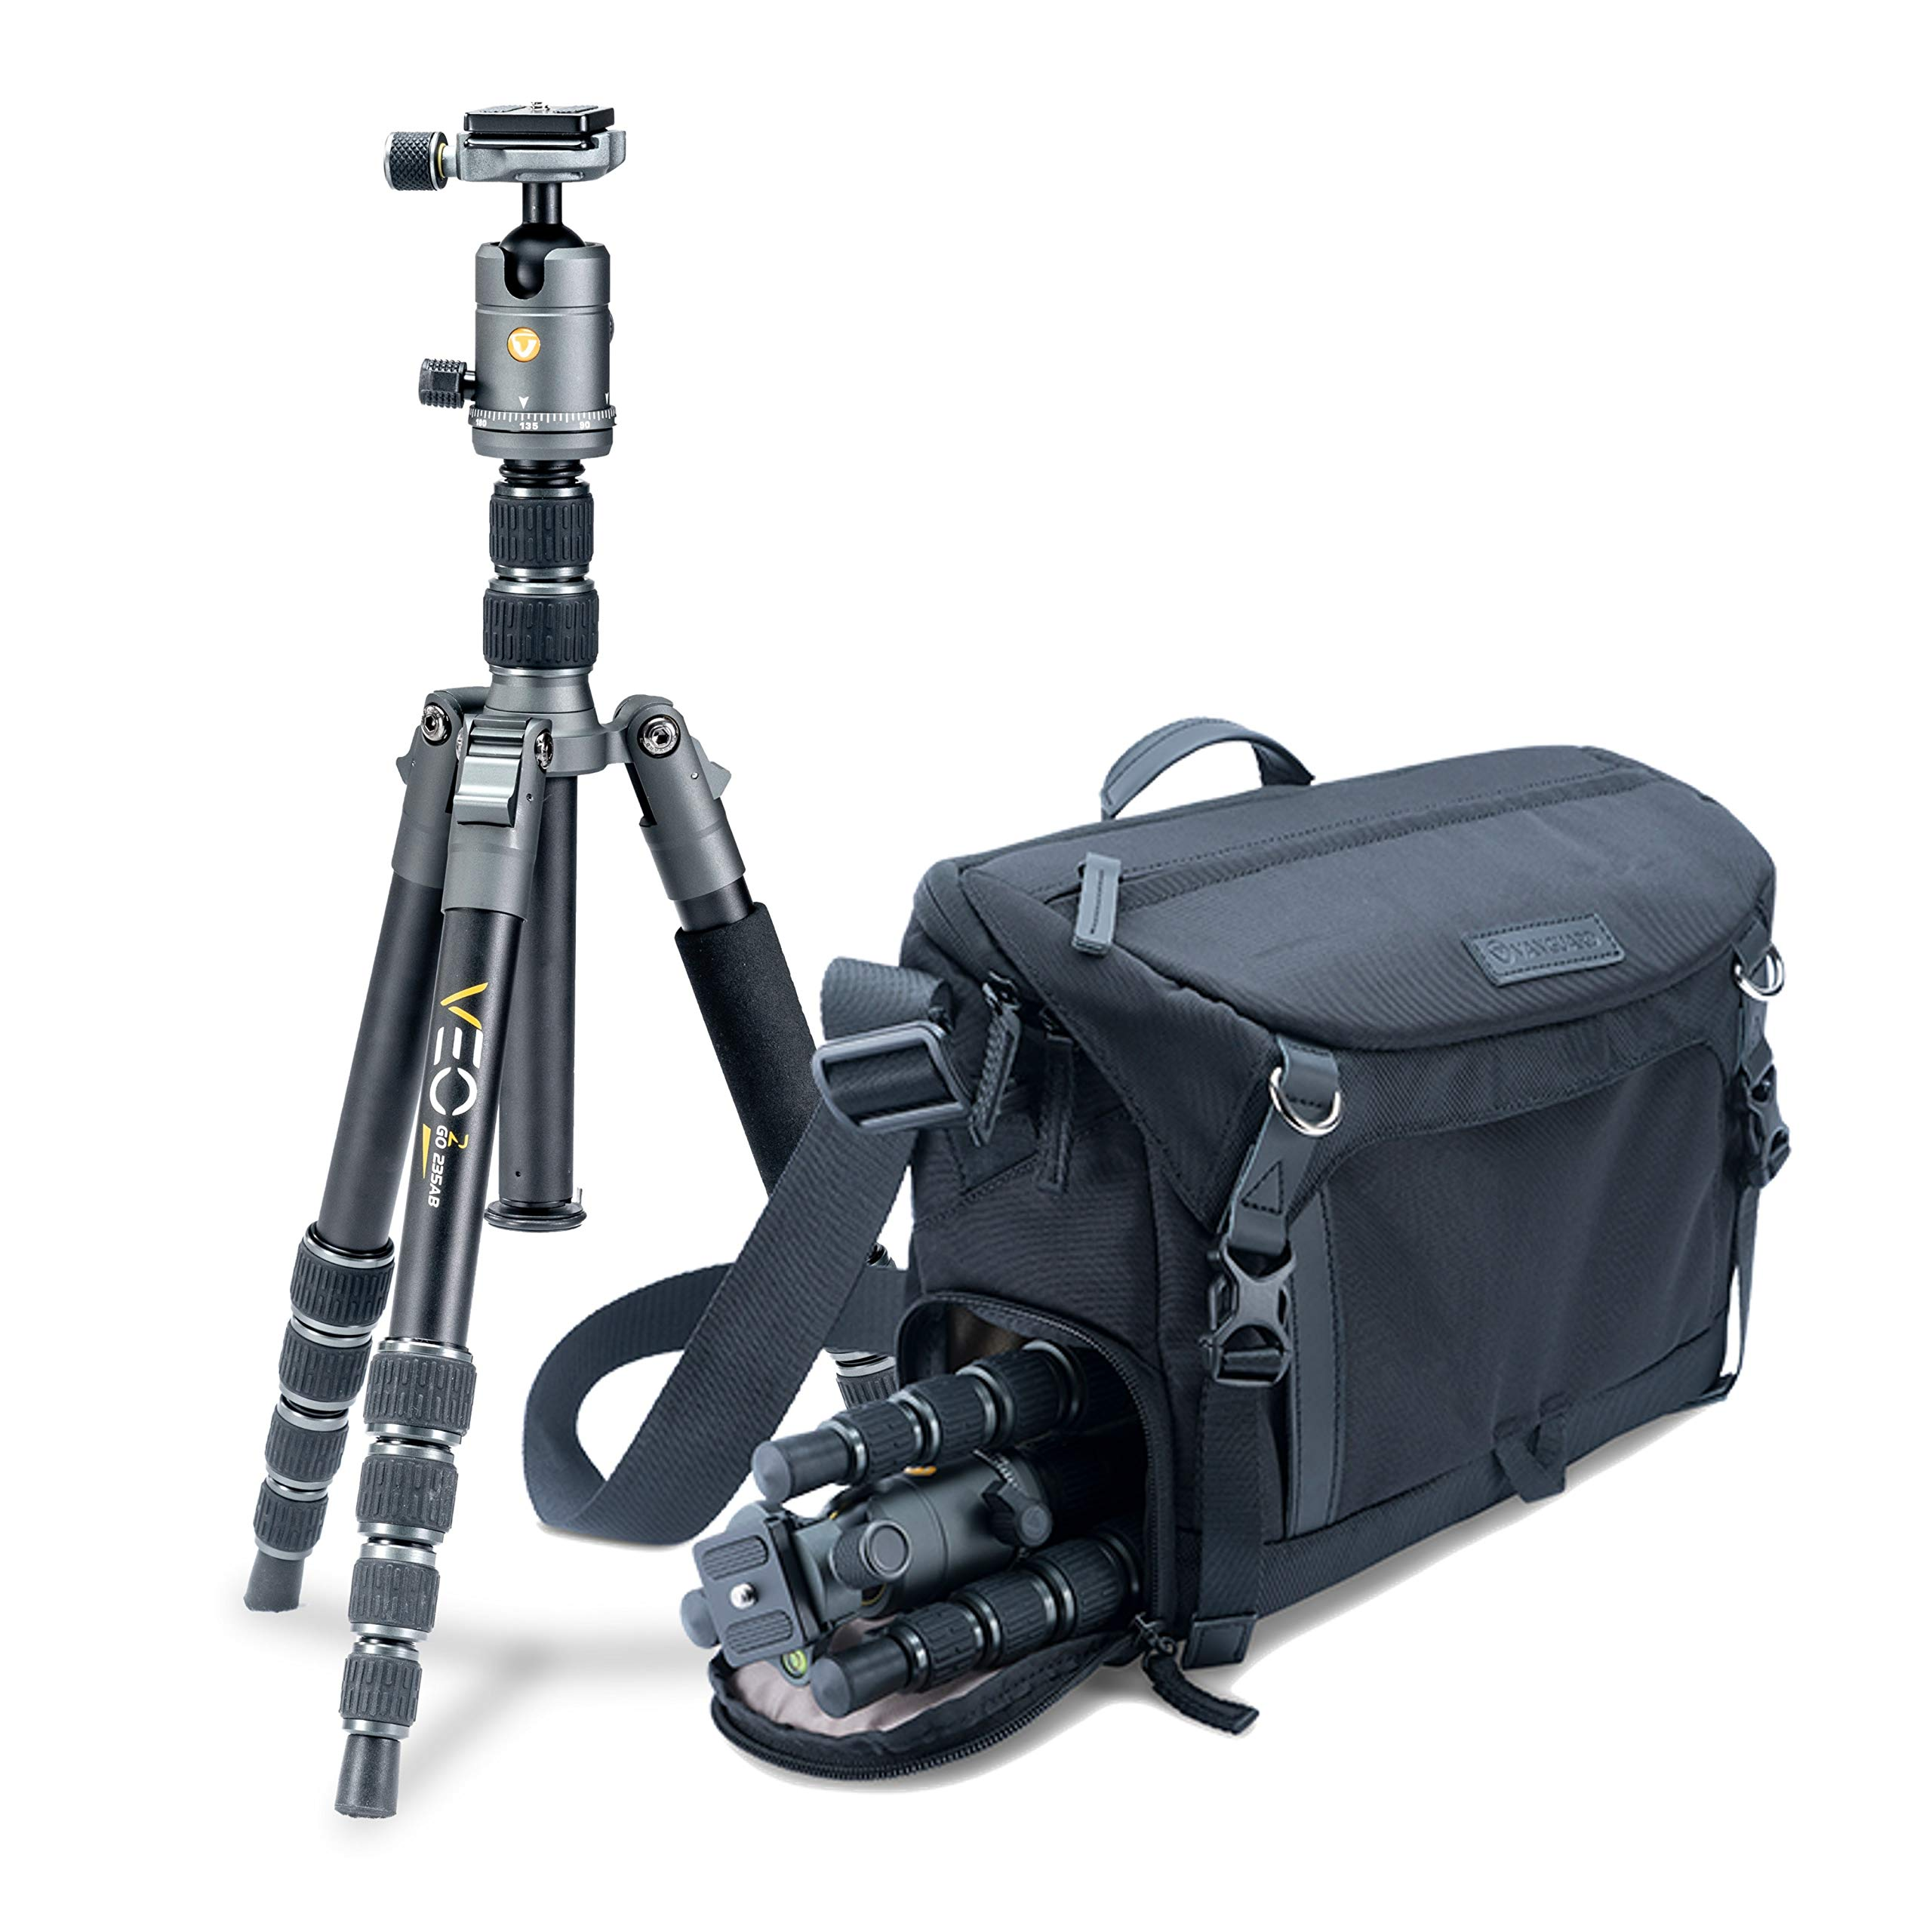 Veo 2GO 235AB Tripod Kit and Veo GO 34M BK Bag by Vanguard